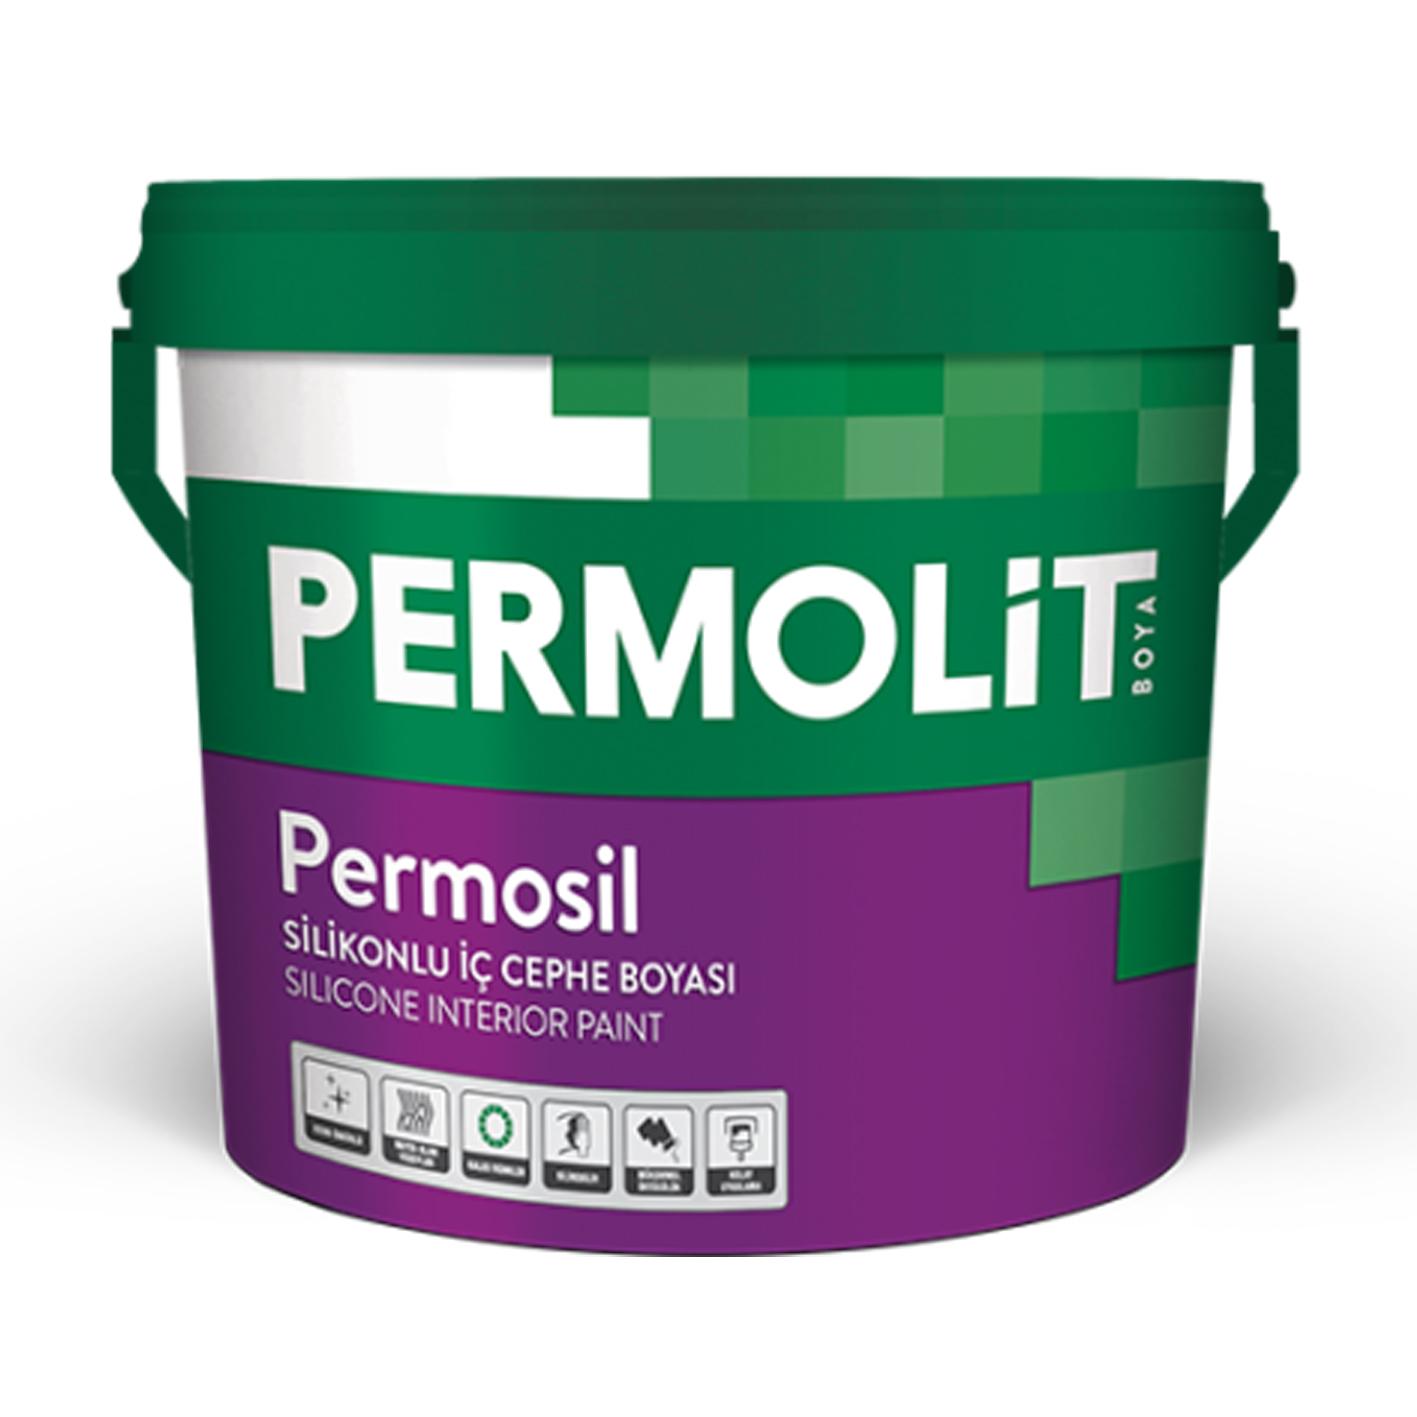 Permolit Permosil İç Cephe Beyaz Baz 3.5Kg